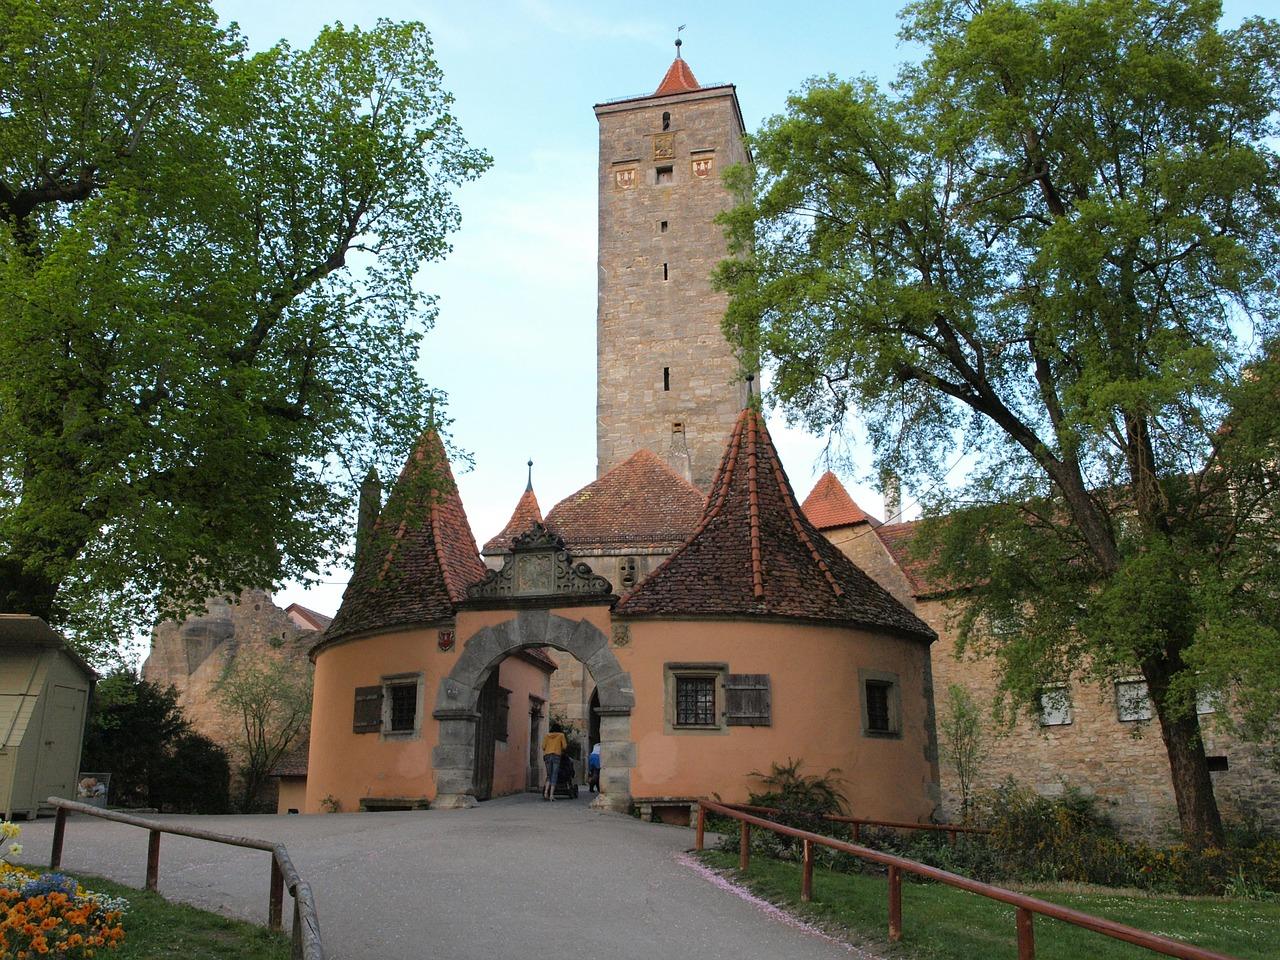 Castle Gardens (Burggarten), Rothenburg ob der Tauber, Germany